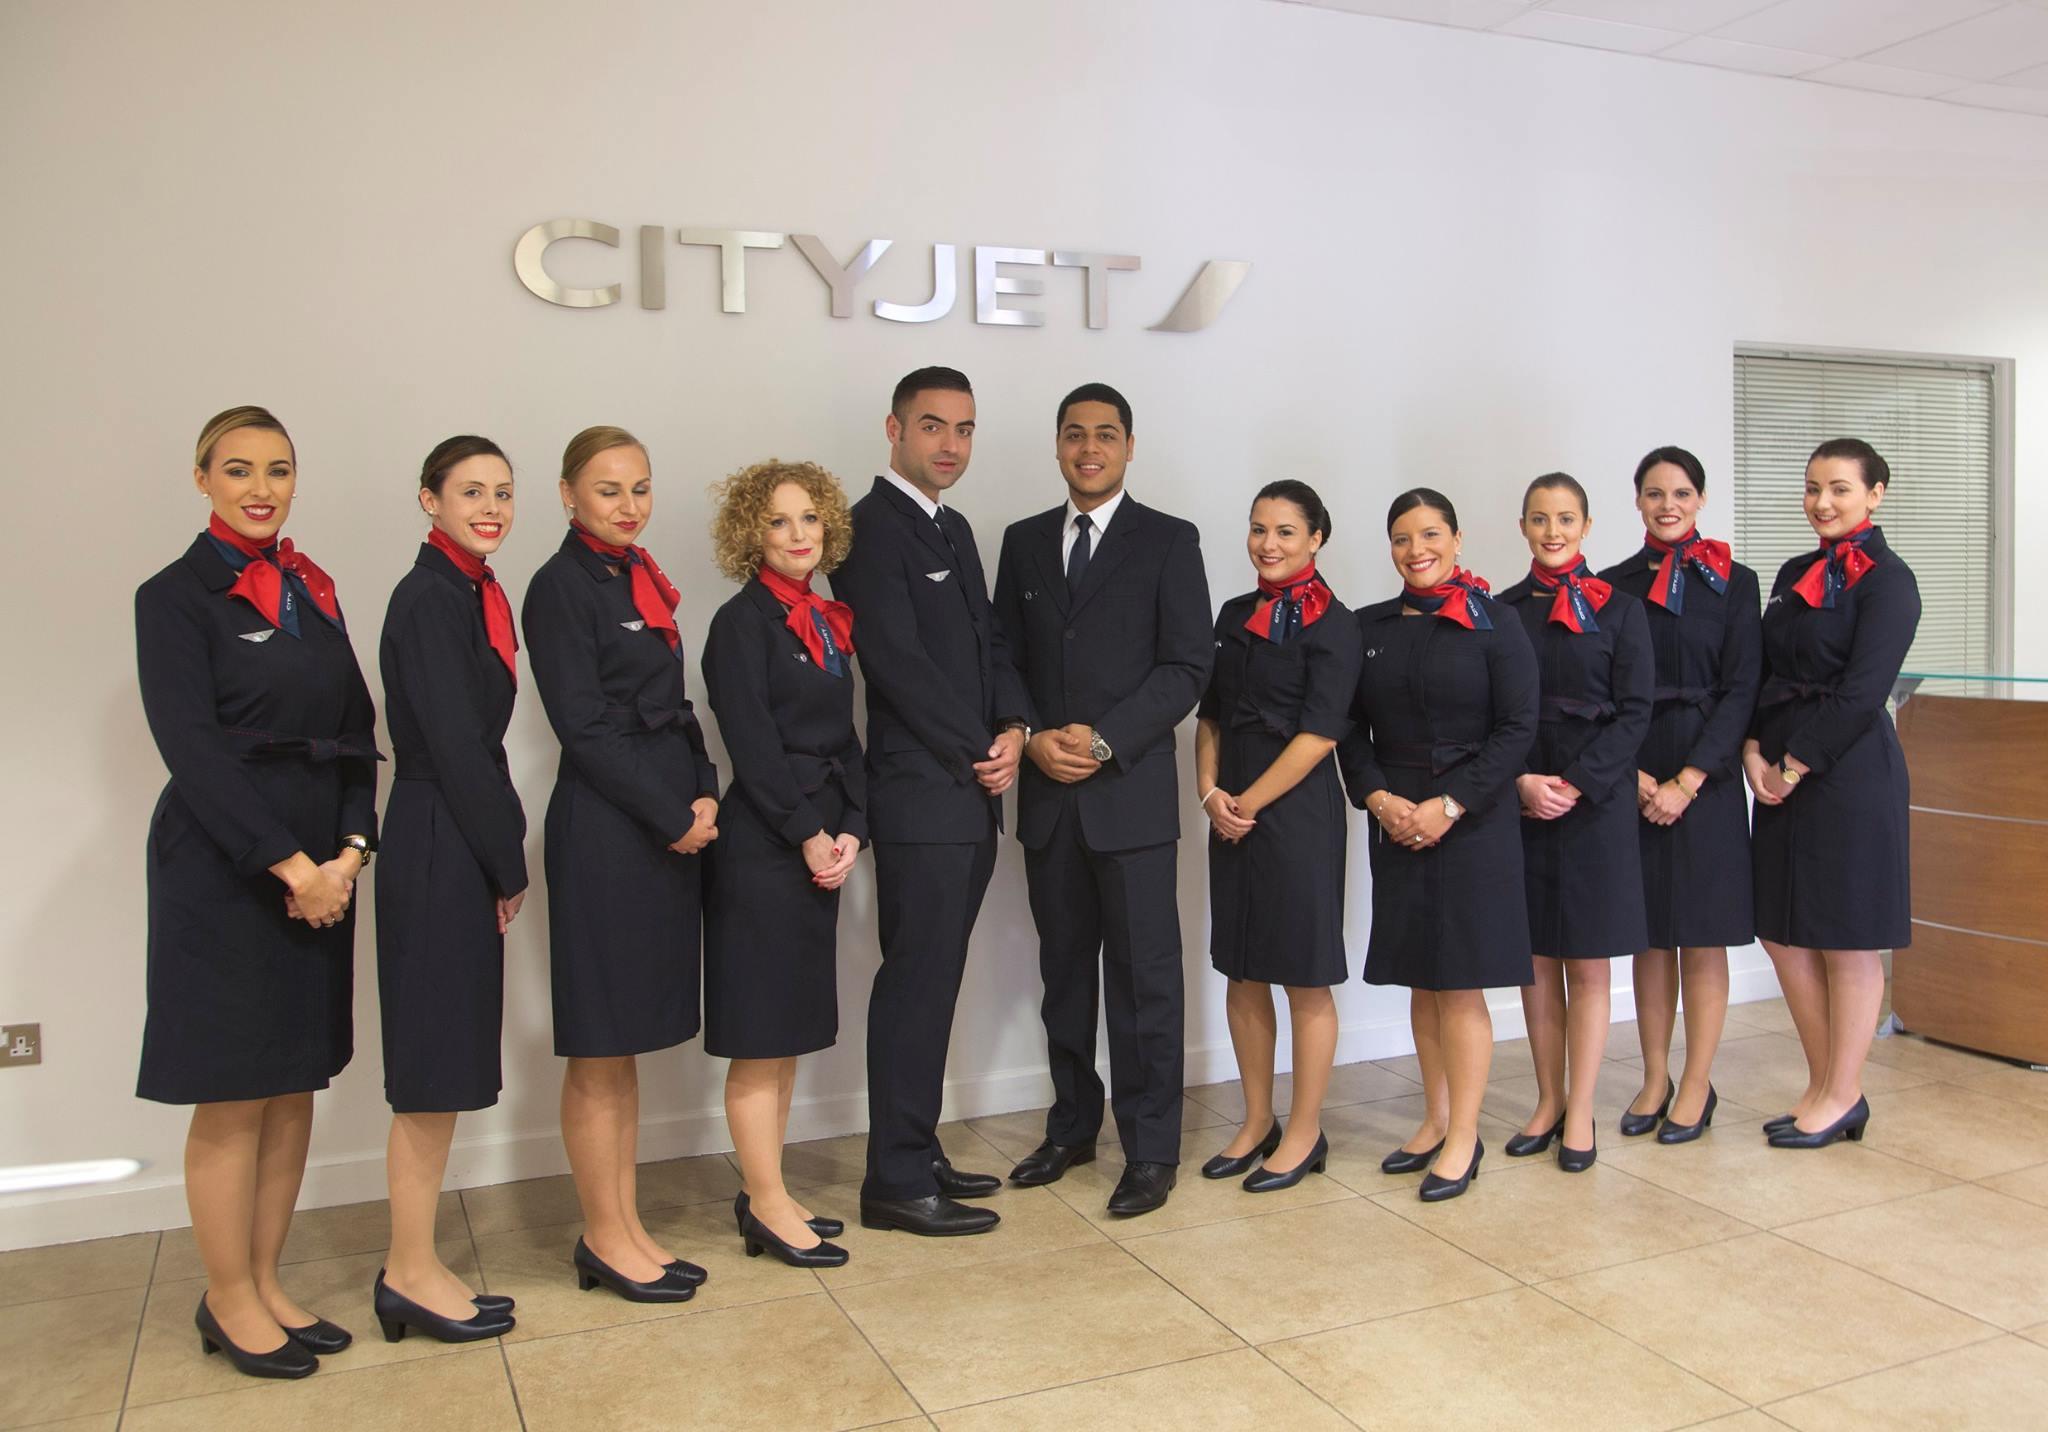 187 Rebranding At Cityjet Completes A Range Of Changes At